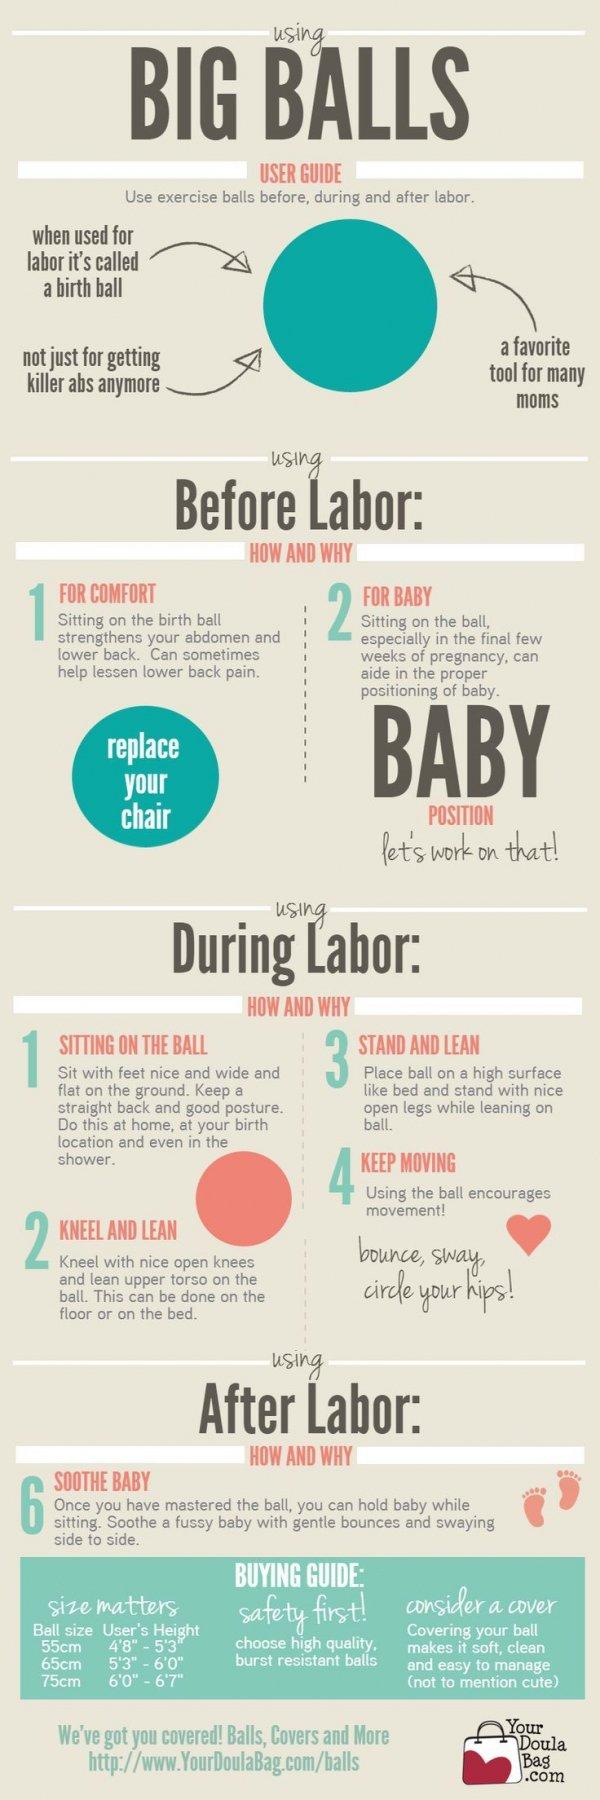 Birth Balls Have so Many Uses